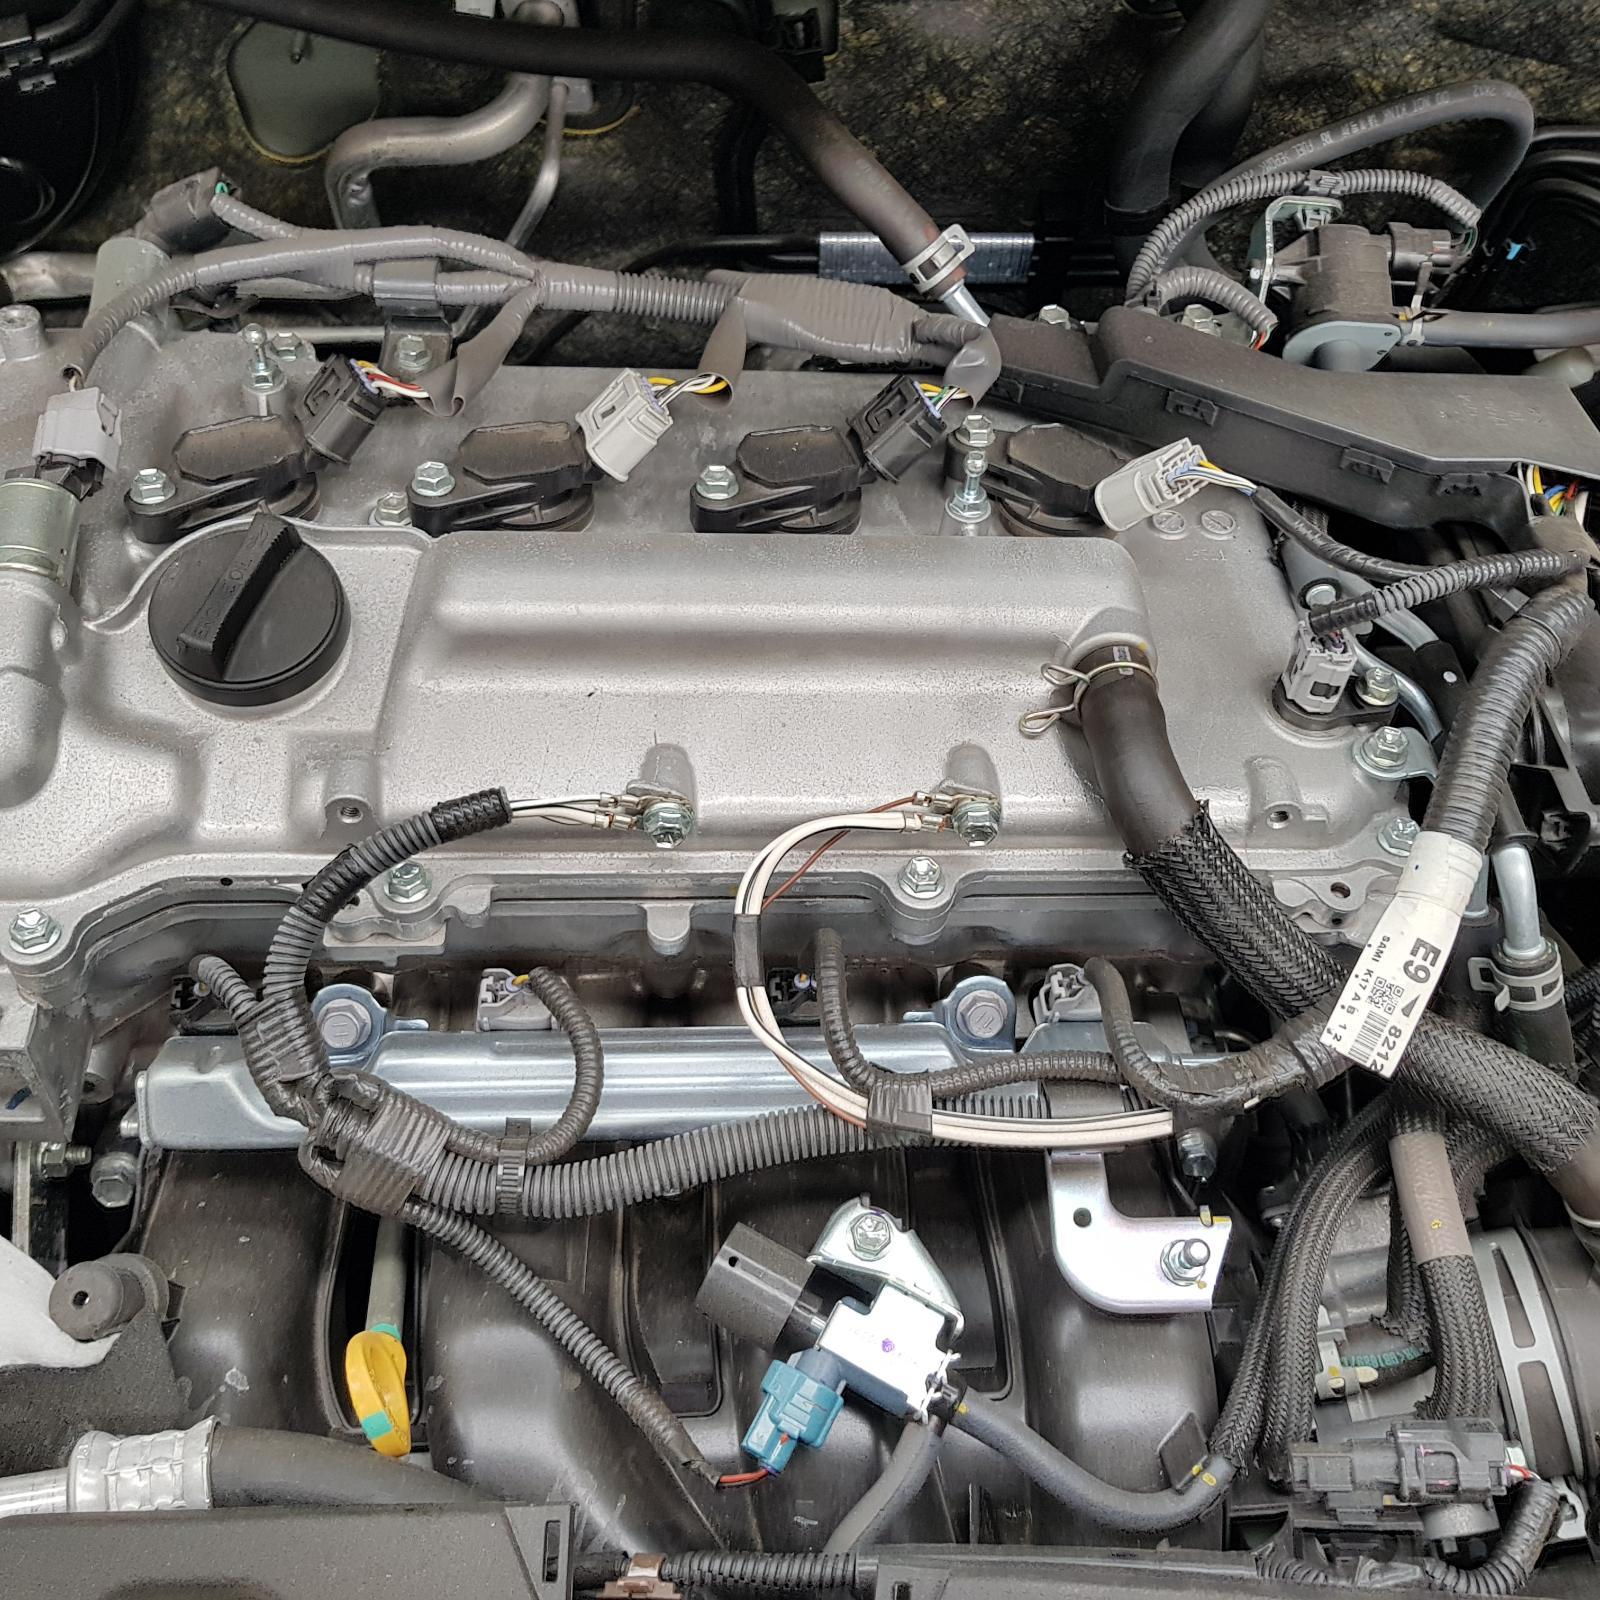 TOYOTA RAV4, Engine, PETROL, 2.0, 3ZR-FE, ASA43, 02/13-